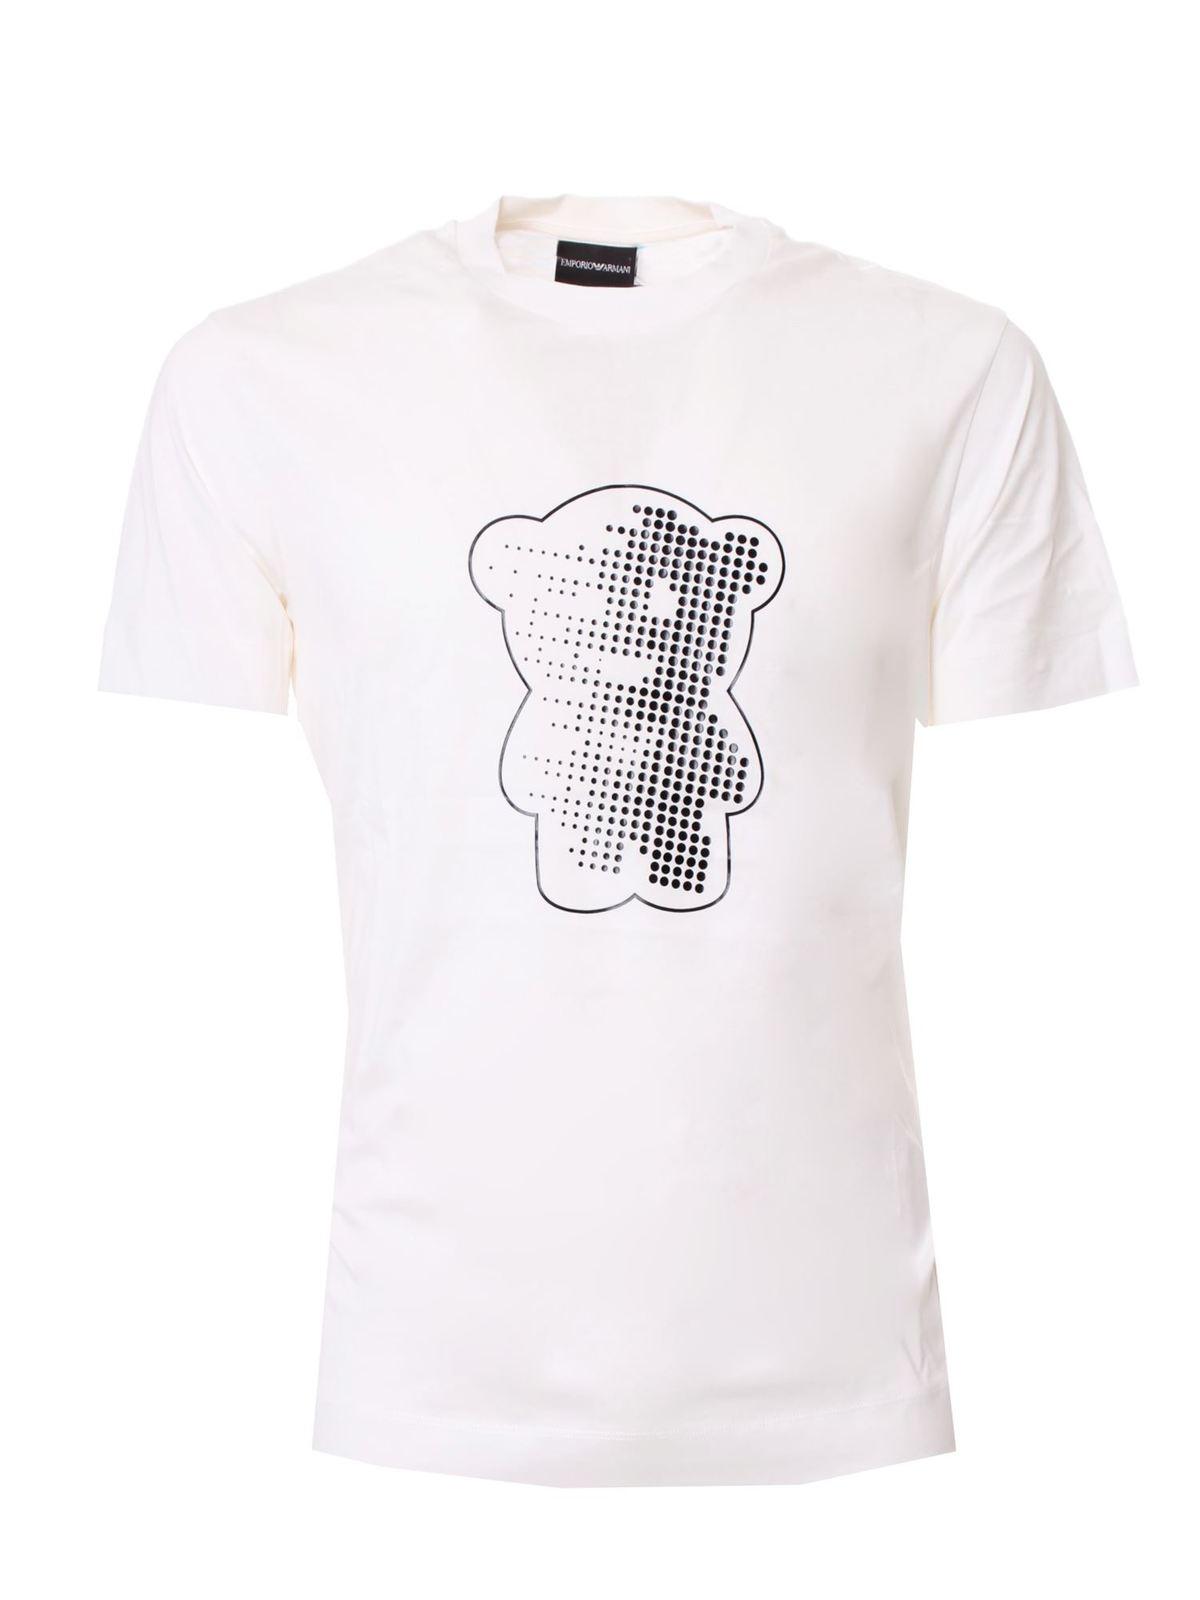 Emporio Armani BLACK PRINT T-SHIRT IN WHITE